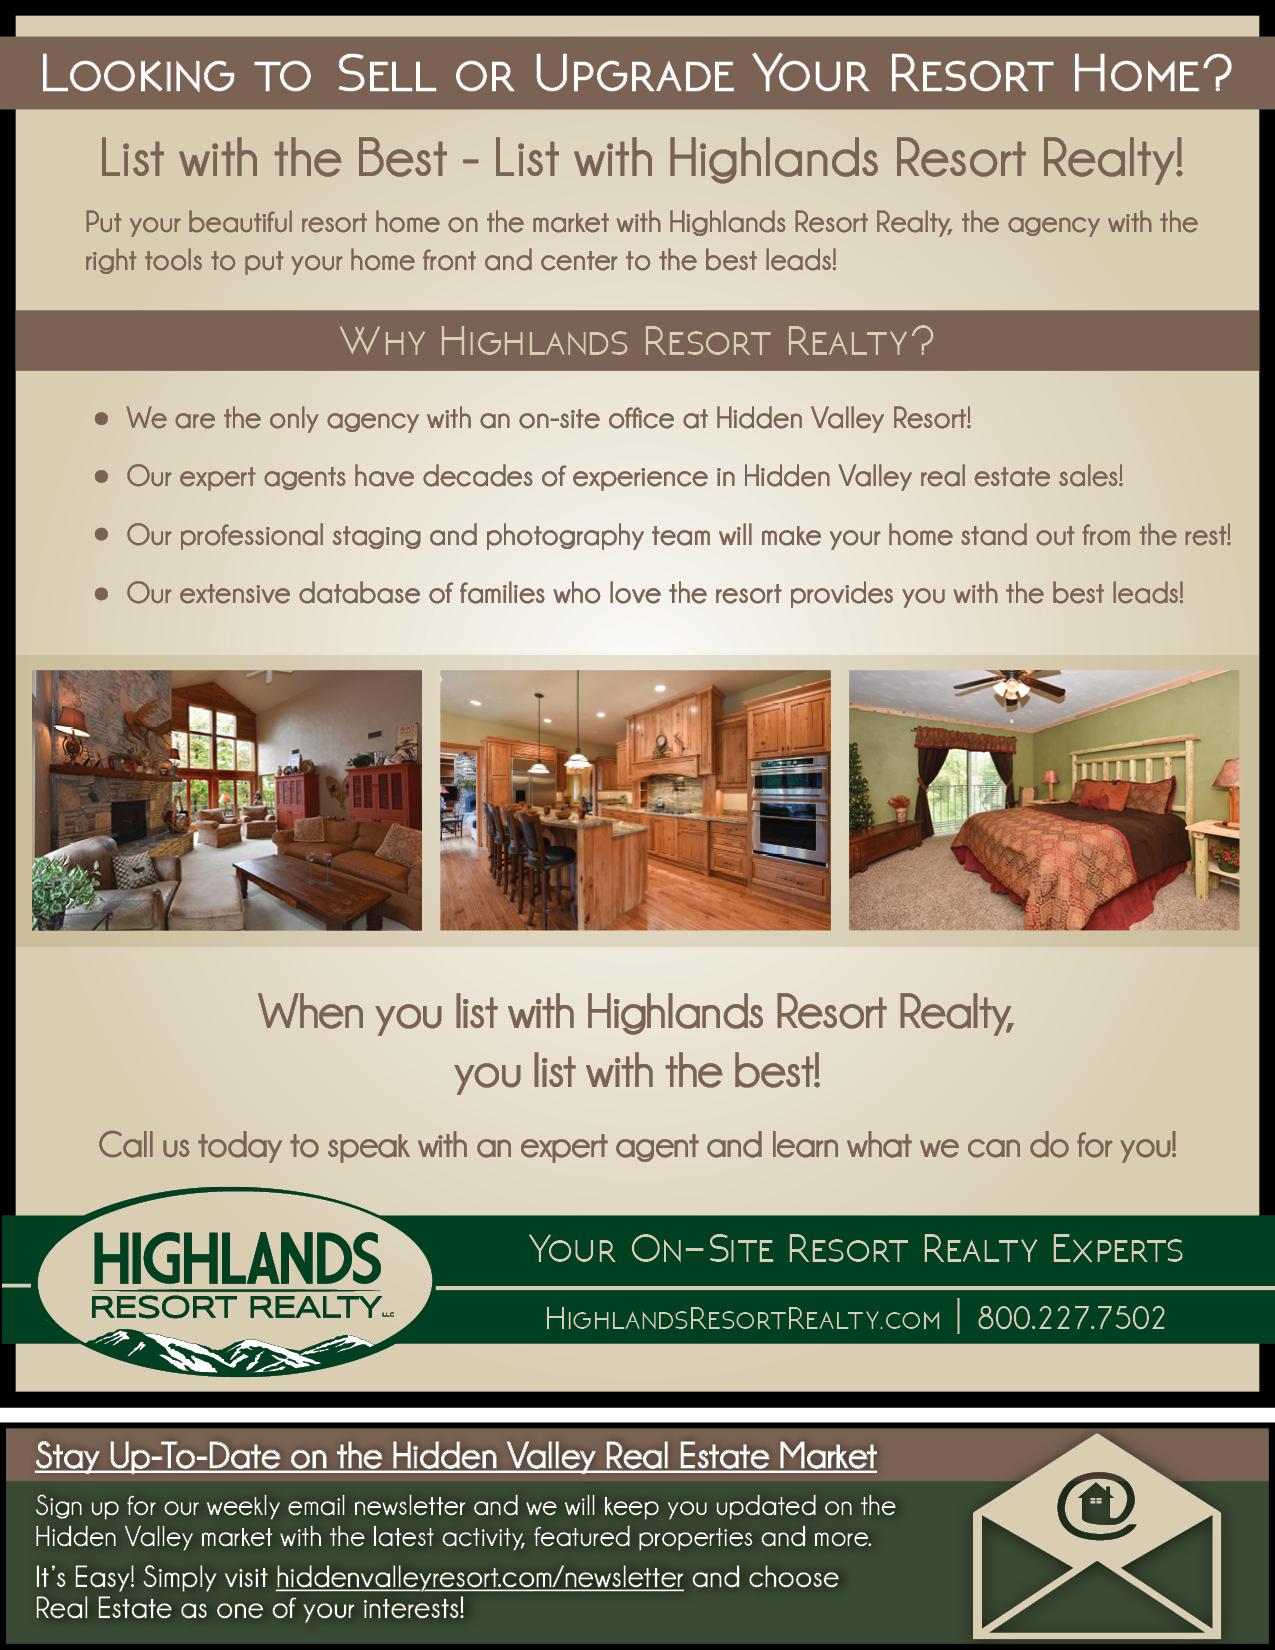 Highlands Resort Realty